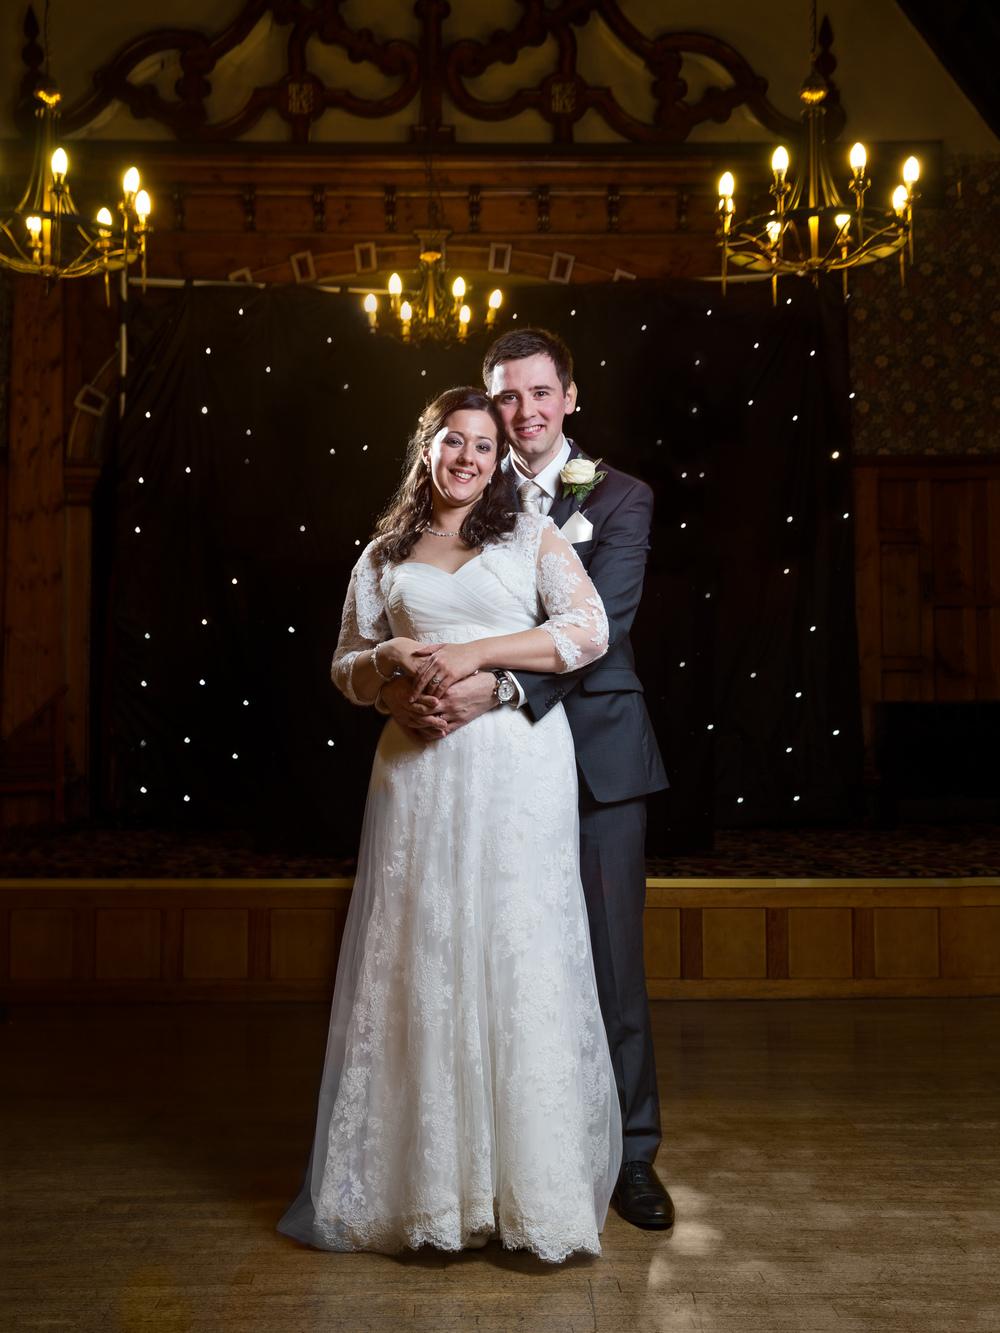 off camera flash photograph at wedding reception